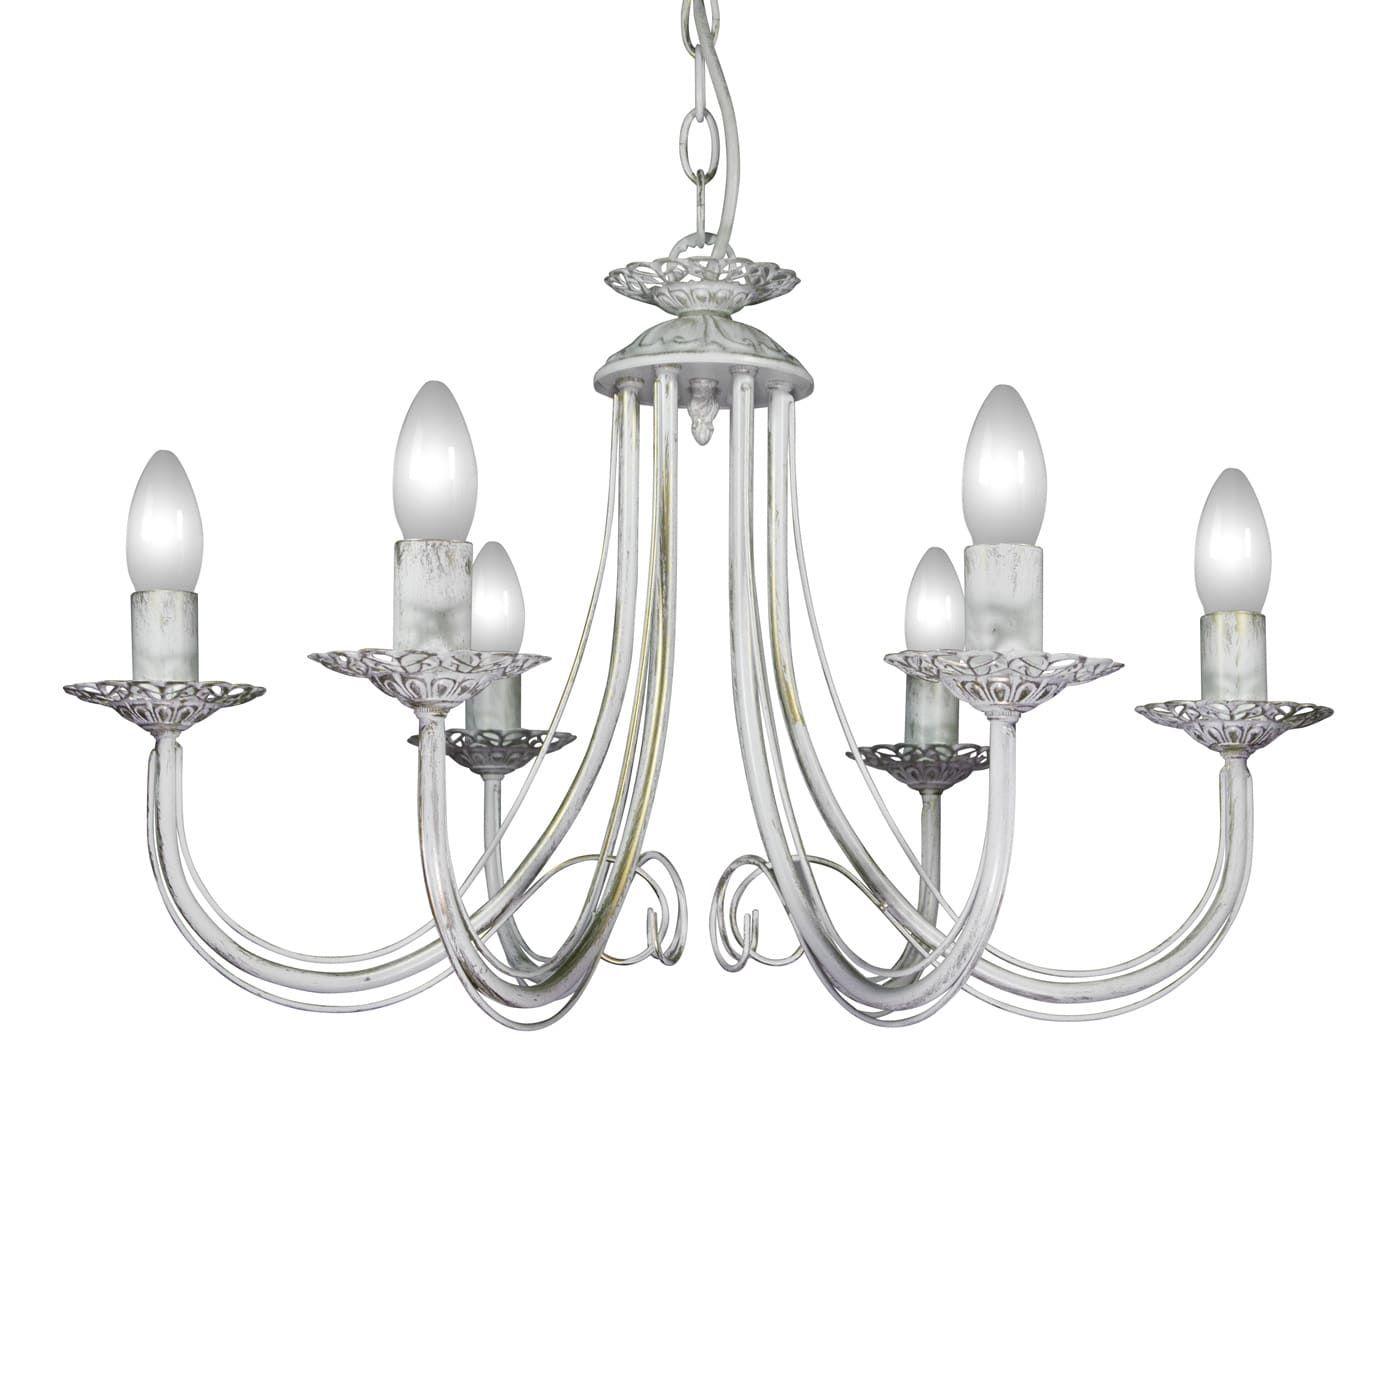 PETRASVET / Pendant chandelier S1165-6, 6xE14 max. 60W